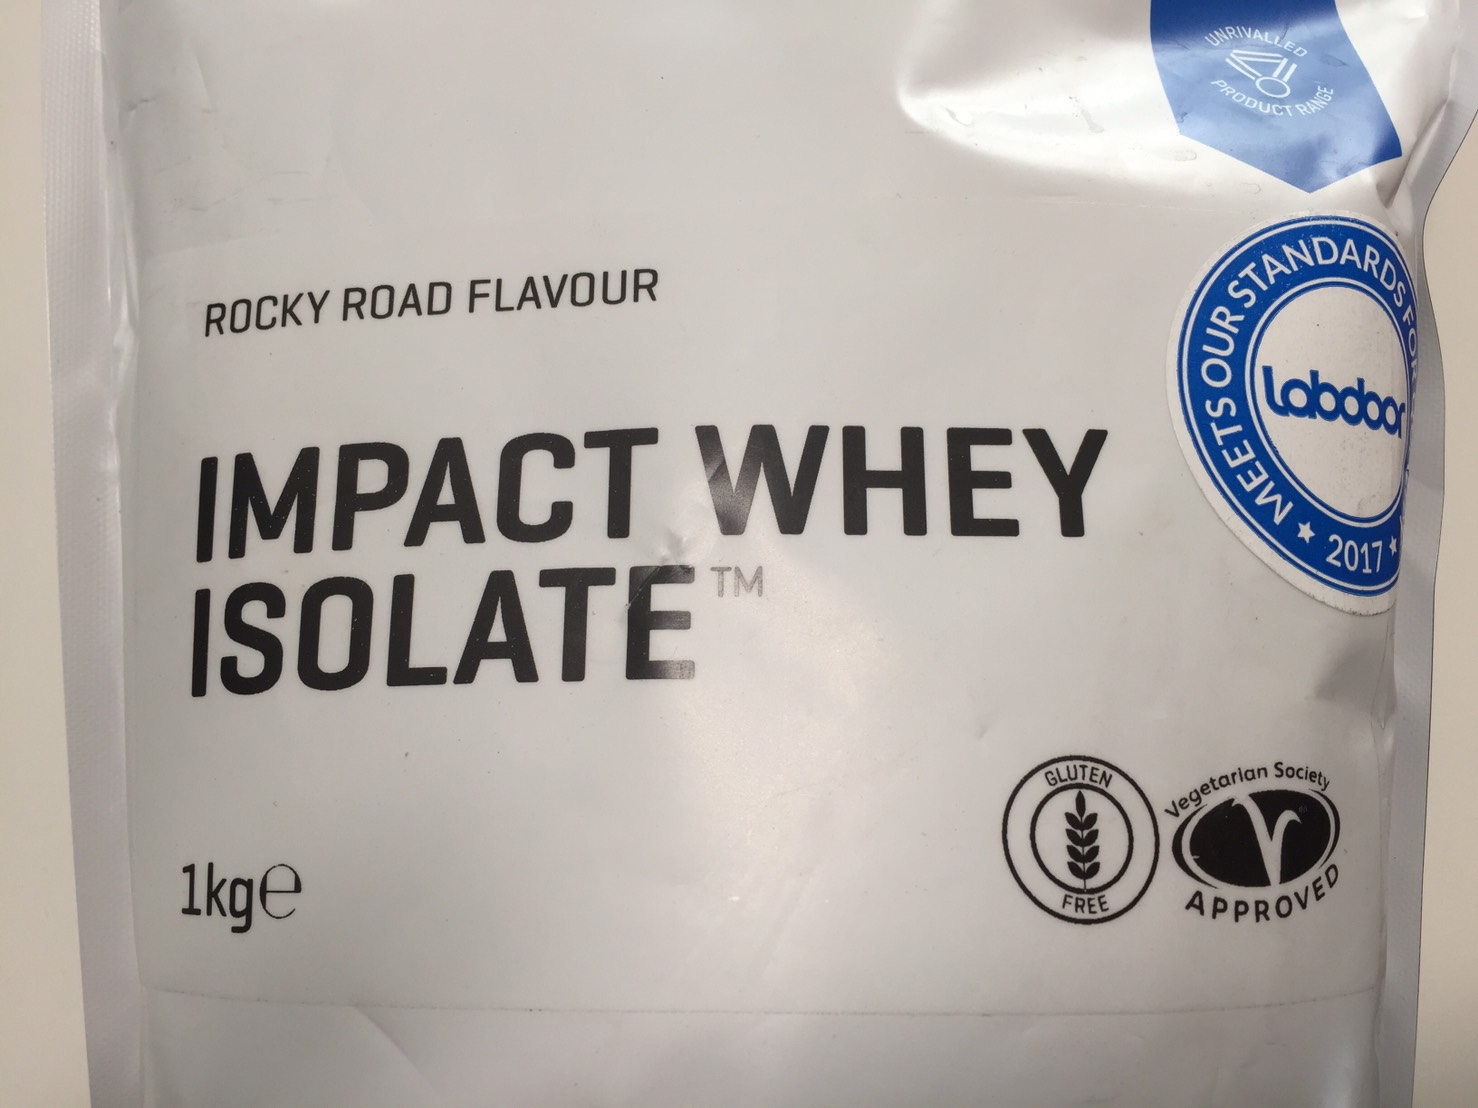 【WPI】IMPACT 分離ホエイプロテイン (アイソレート)「ROCKY ROAD FLAVOUR(ロッキーロード味)」